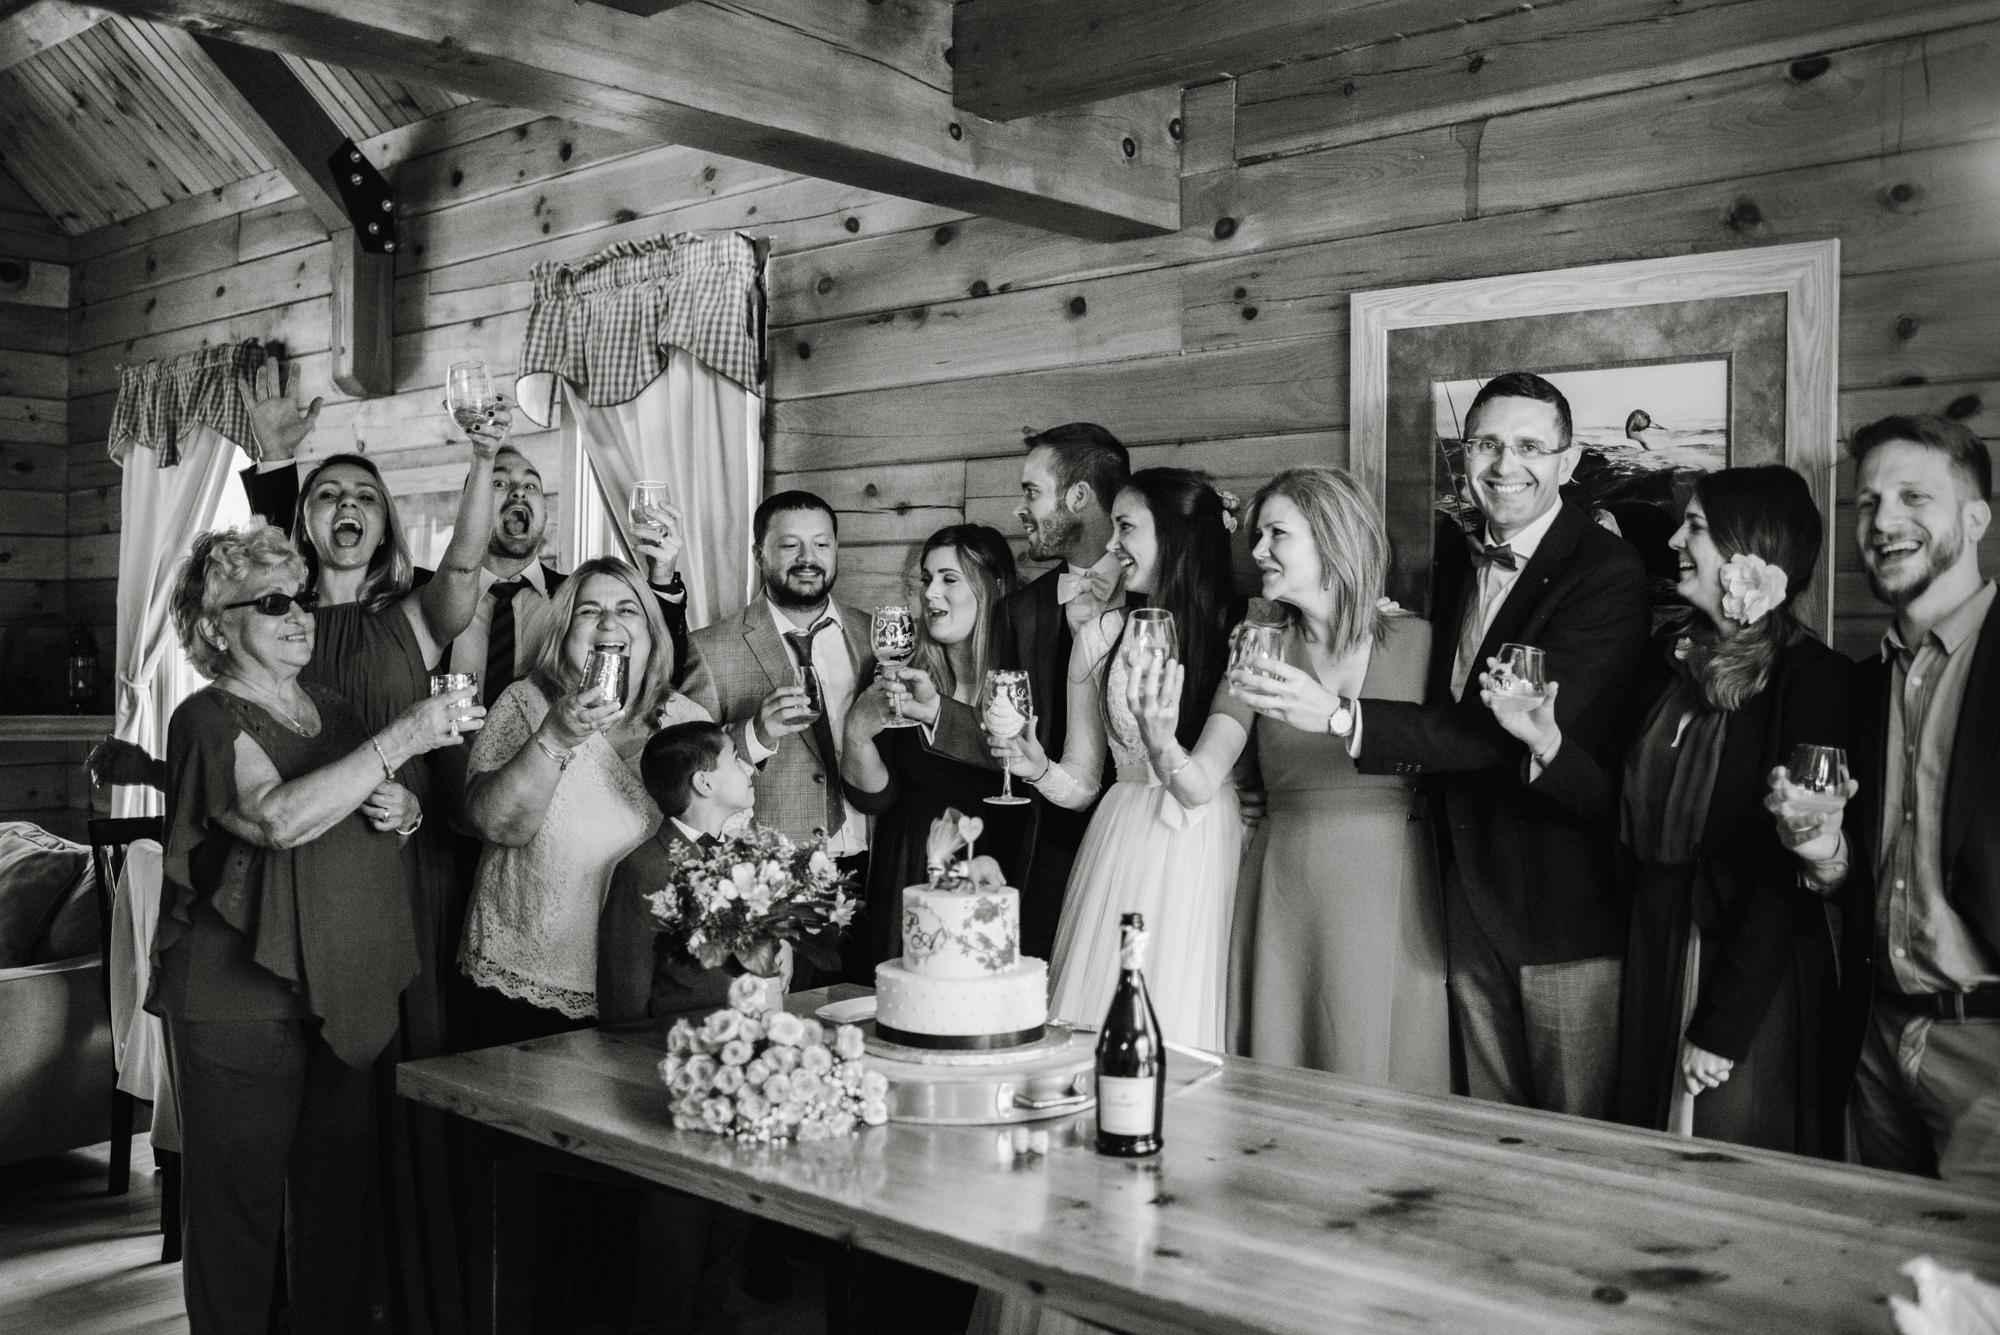 Paula and Andrew - Small Adventurous Wedding in Shenandoah National Park - Blue Ridge Mountain Wedding - White Sails Creative - Mountain Elopement_11.jpg